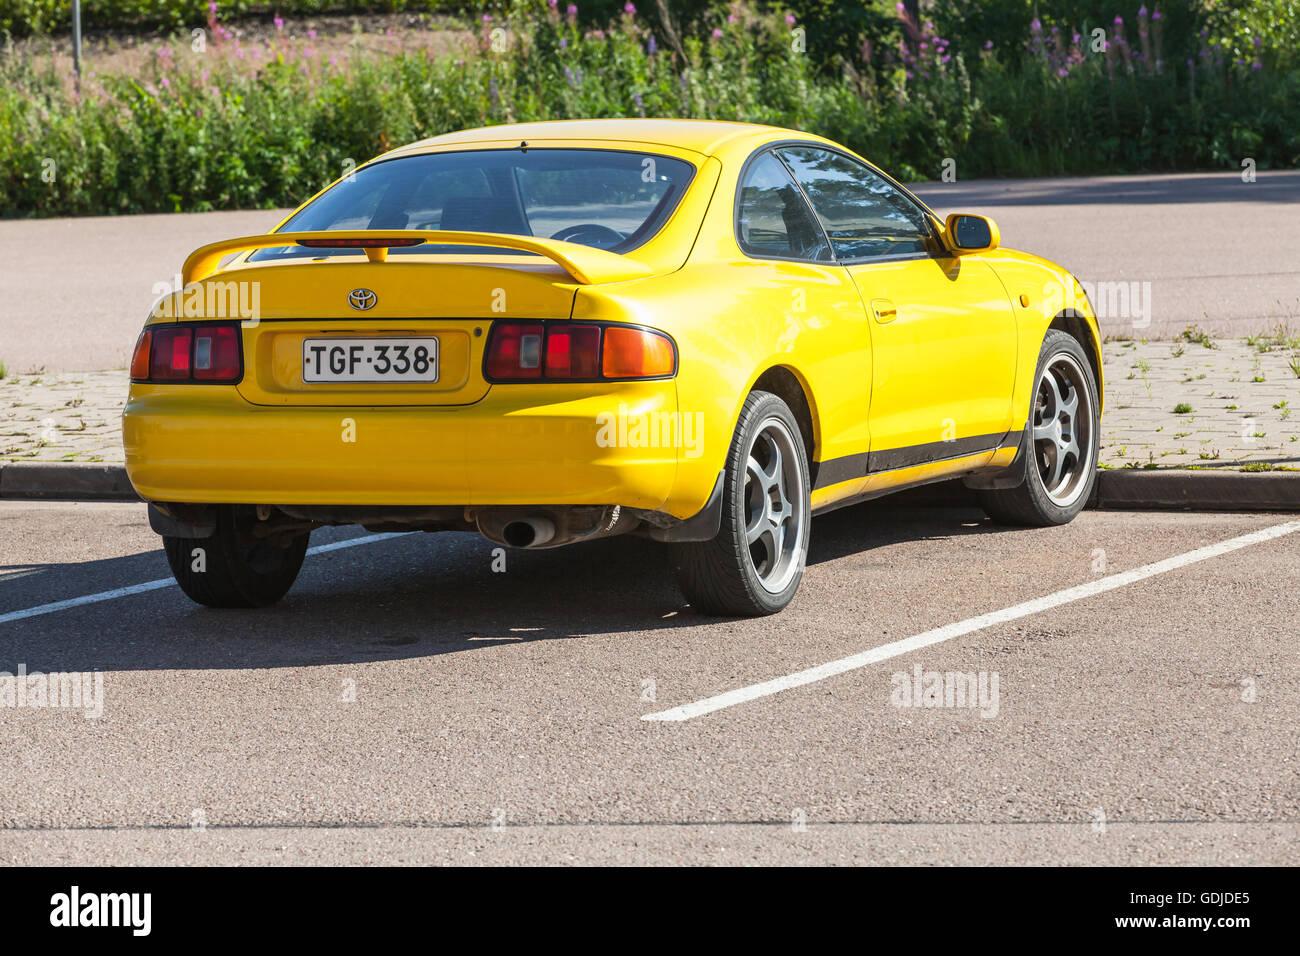 Kotka, Finland - July 16, 2016: Bright Yellow Facelift Toyota Celica GT liftback T200 model of 1994-1999, closeup Stock Photo